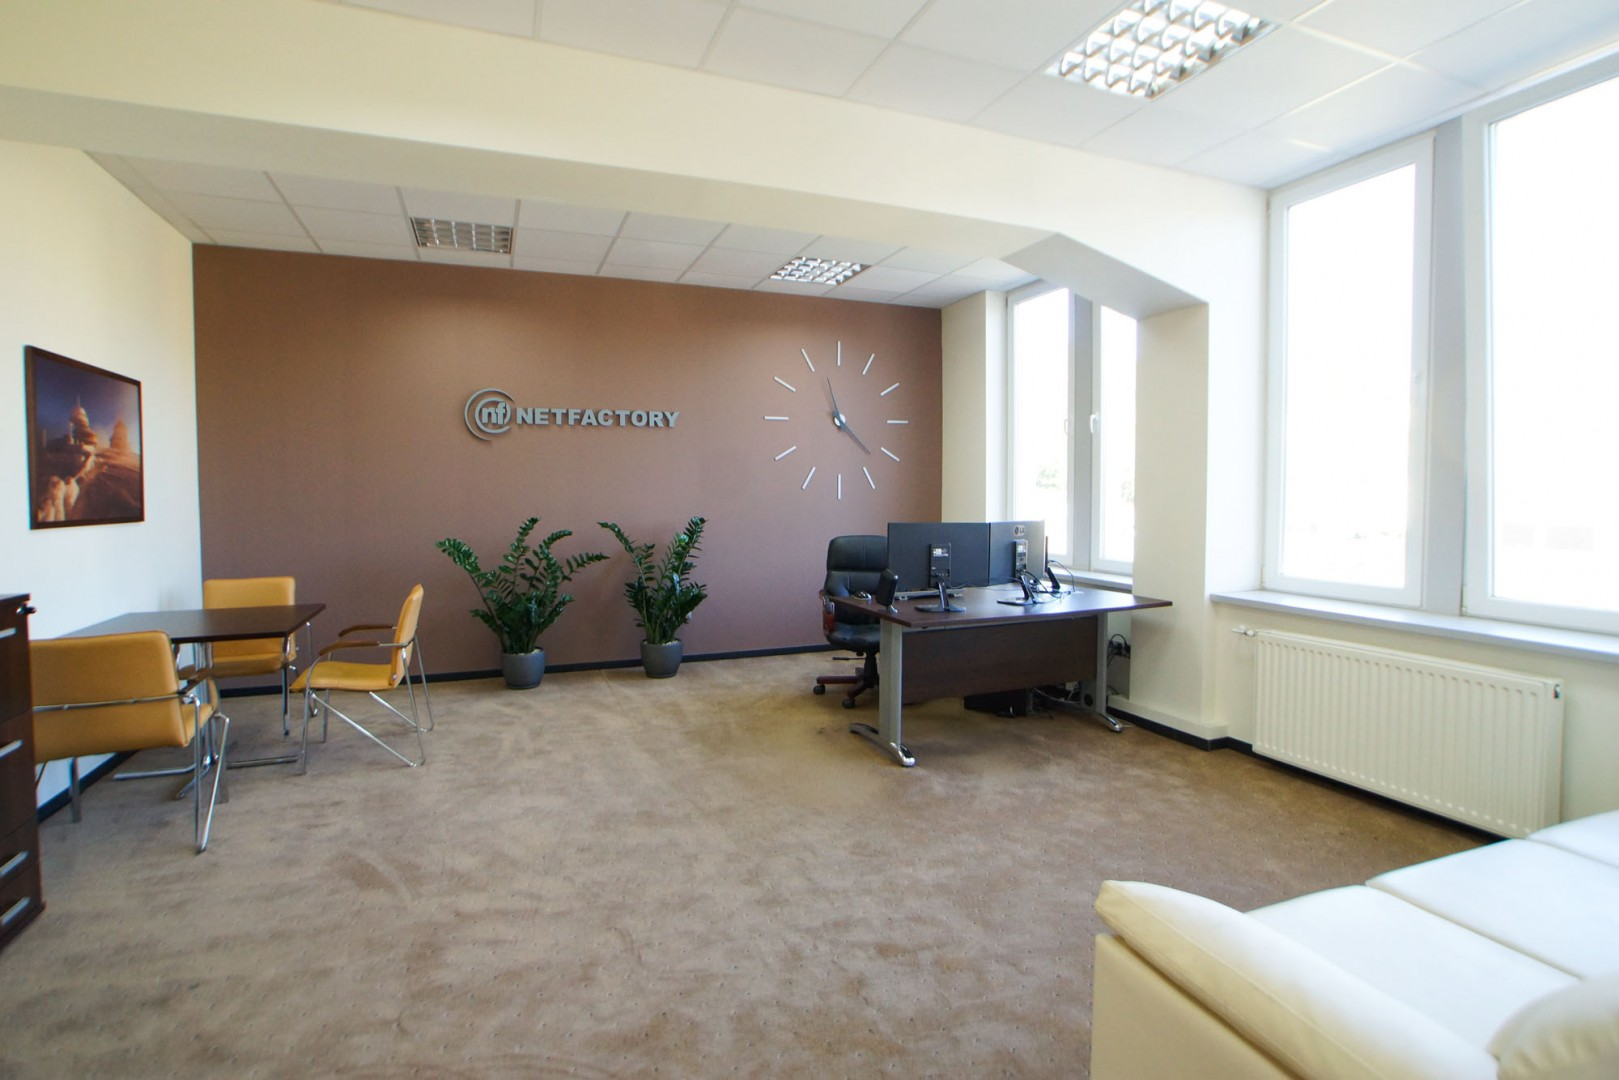 portale darmowe Jelenia Góra